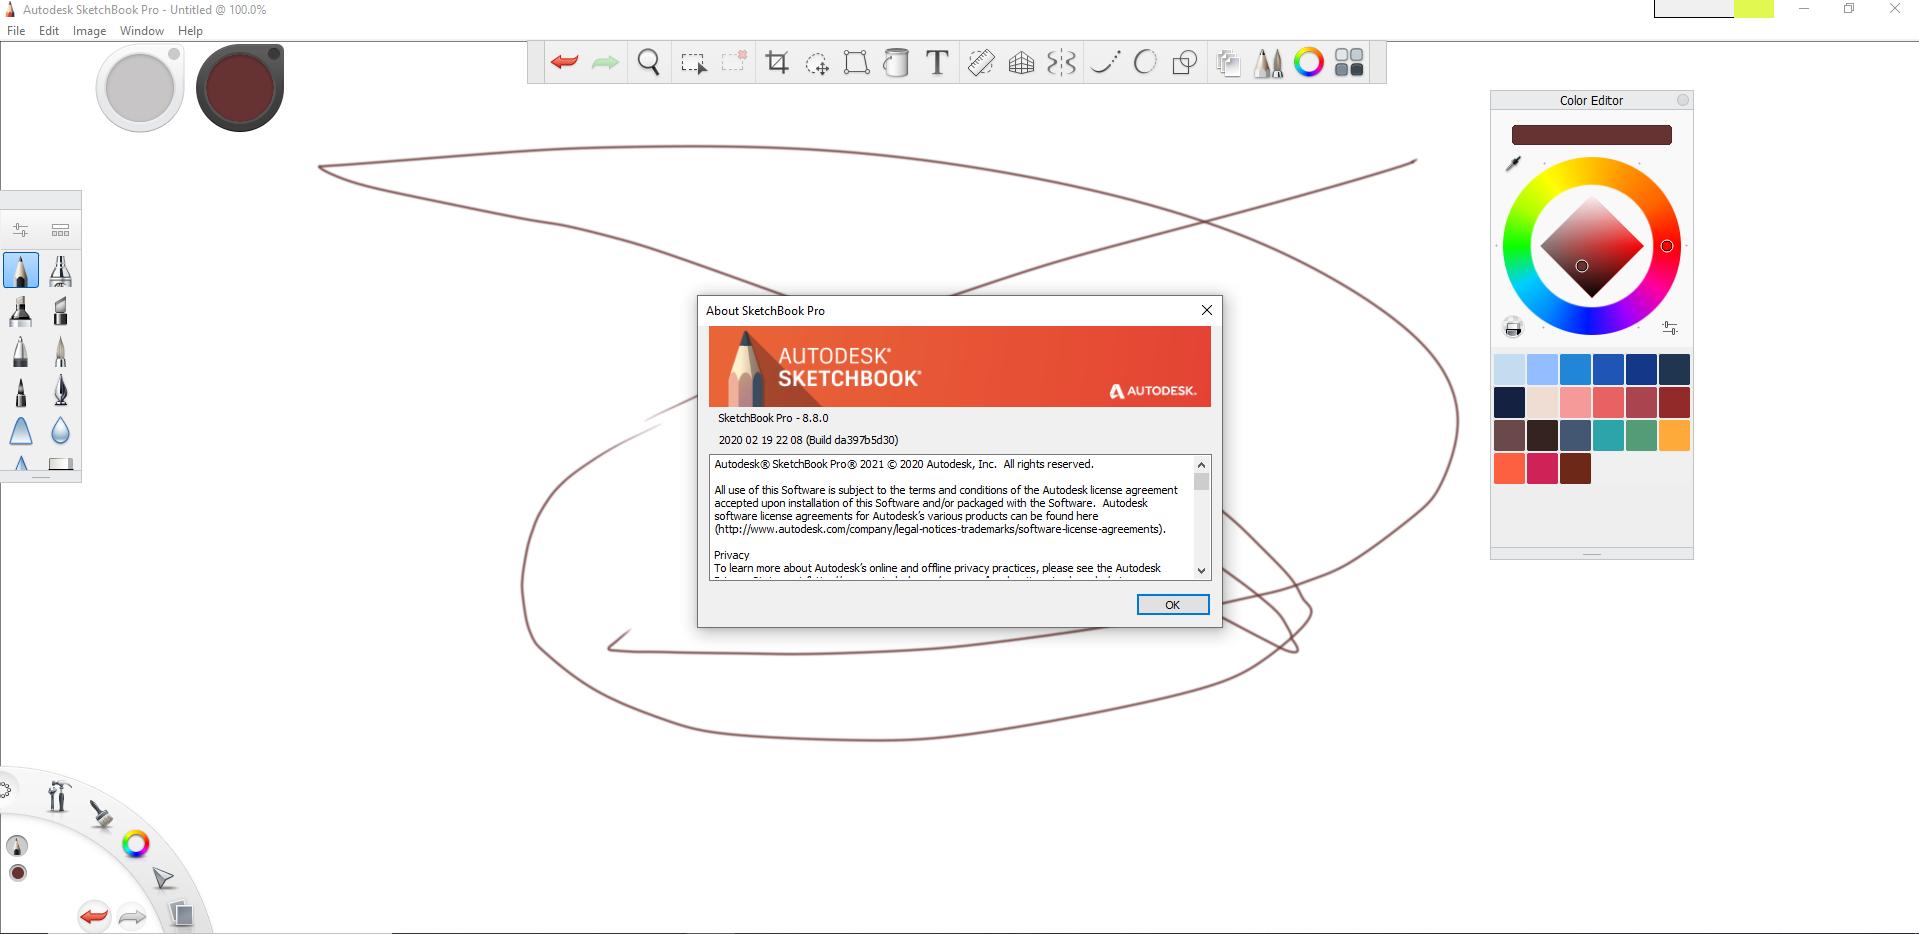 Working with Autodesk SketchBook Pro 2021 v8.8.0 full license